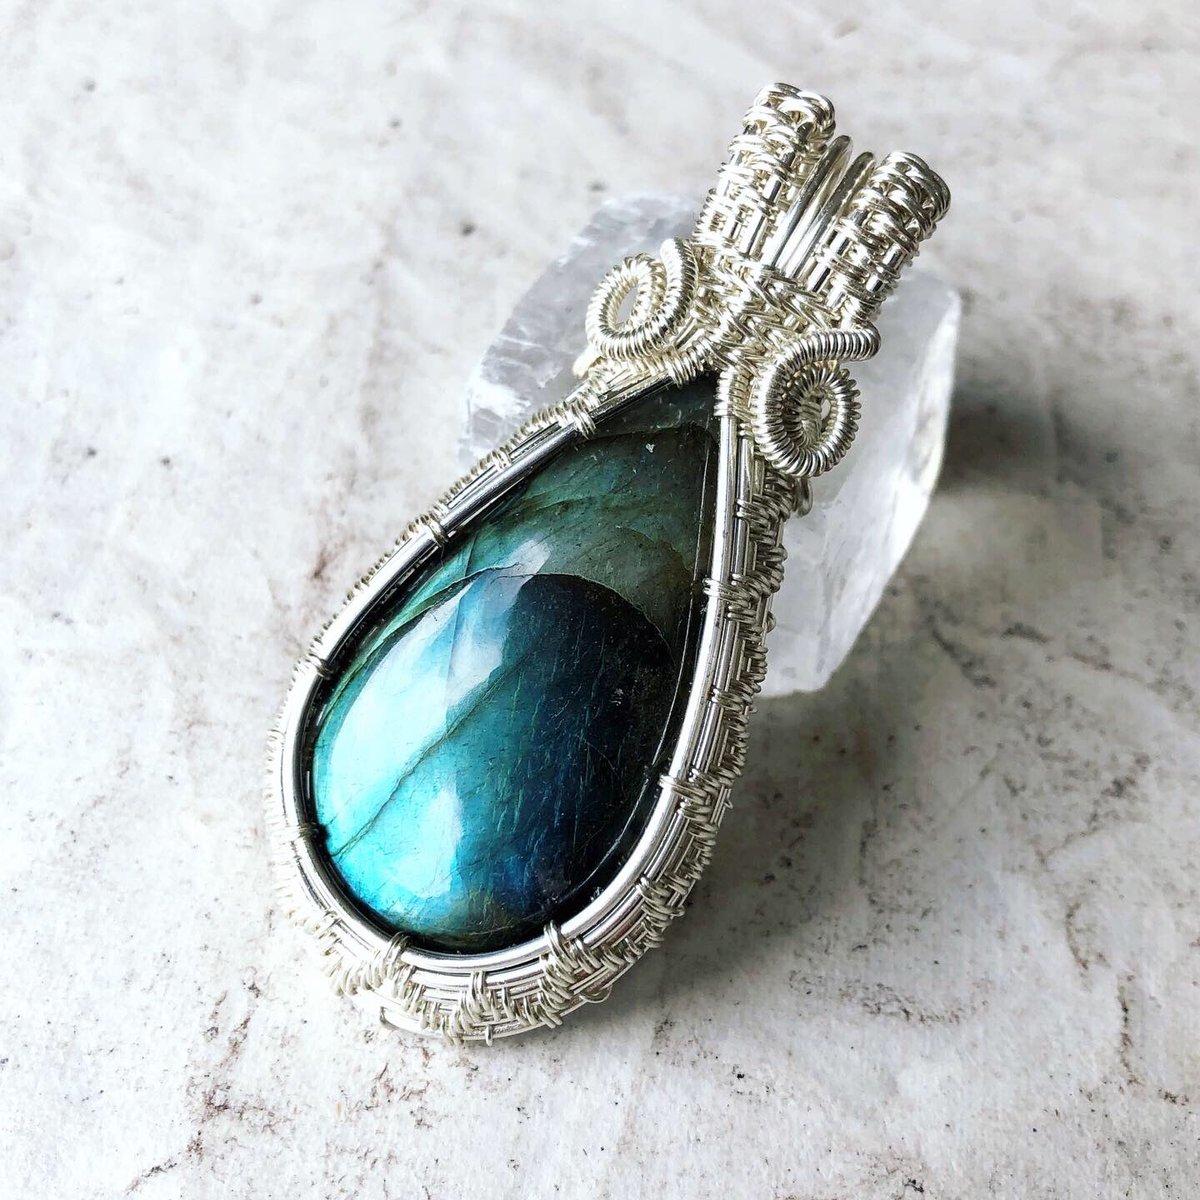 New in my Etsy shop   Gorgeous green blue flash Labradorite pendant https://etsy.me/2ZHa7wq   #ethicalfashion #ethicaljewellery #ethicaljewelry #labradorite #labradoritejewellery #labradoritejewelry #labradoritependant #handmadejewellery #supportsmallbusinesspic.twitter.com/ZuHhPk1MrQ